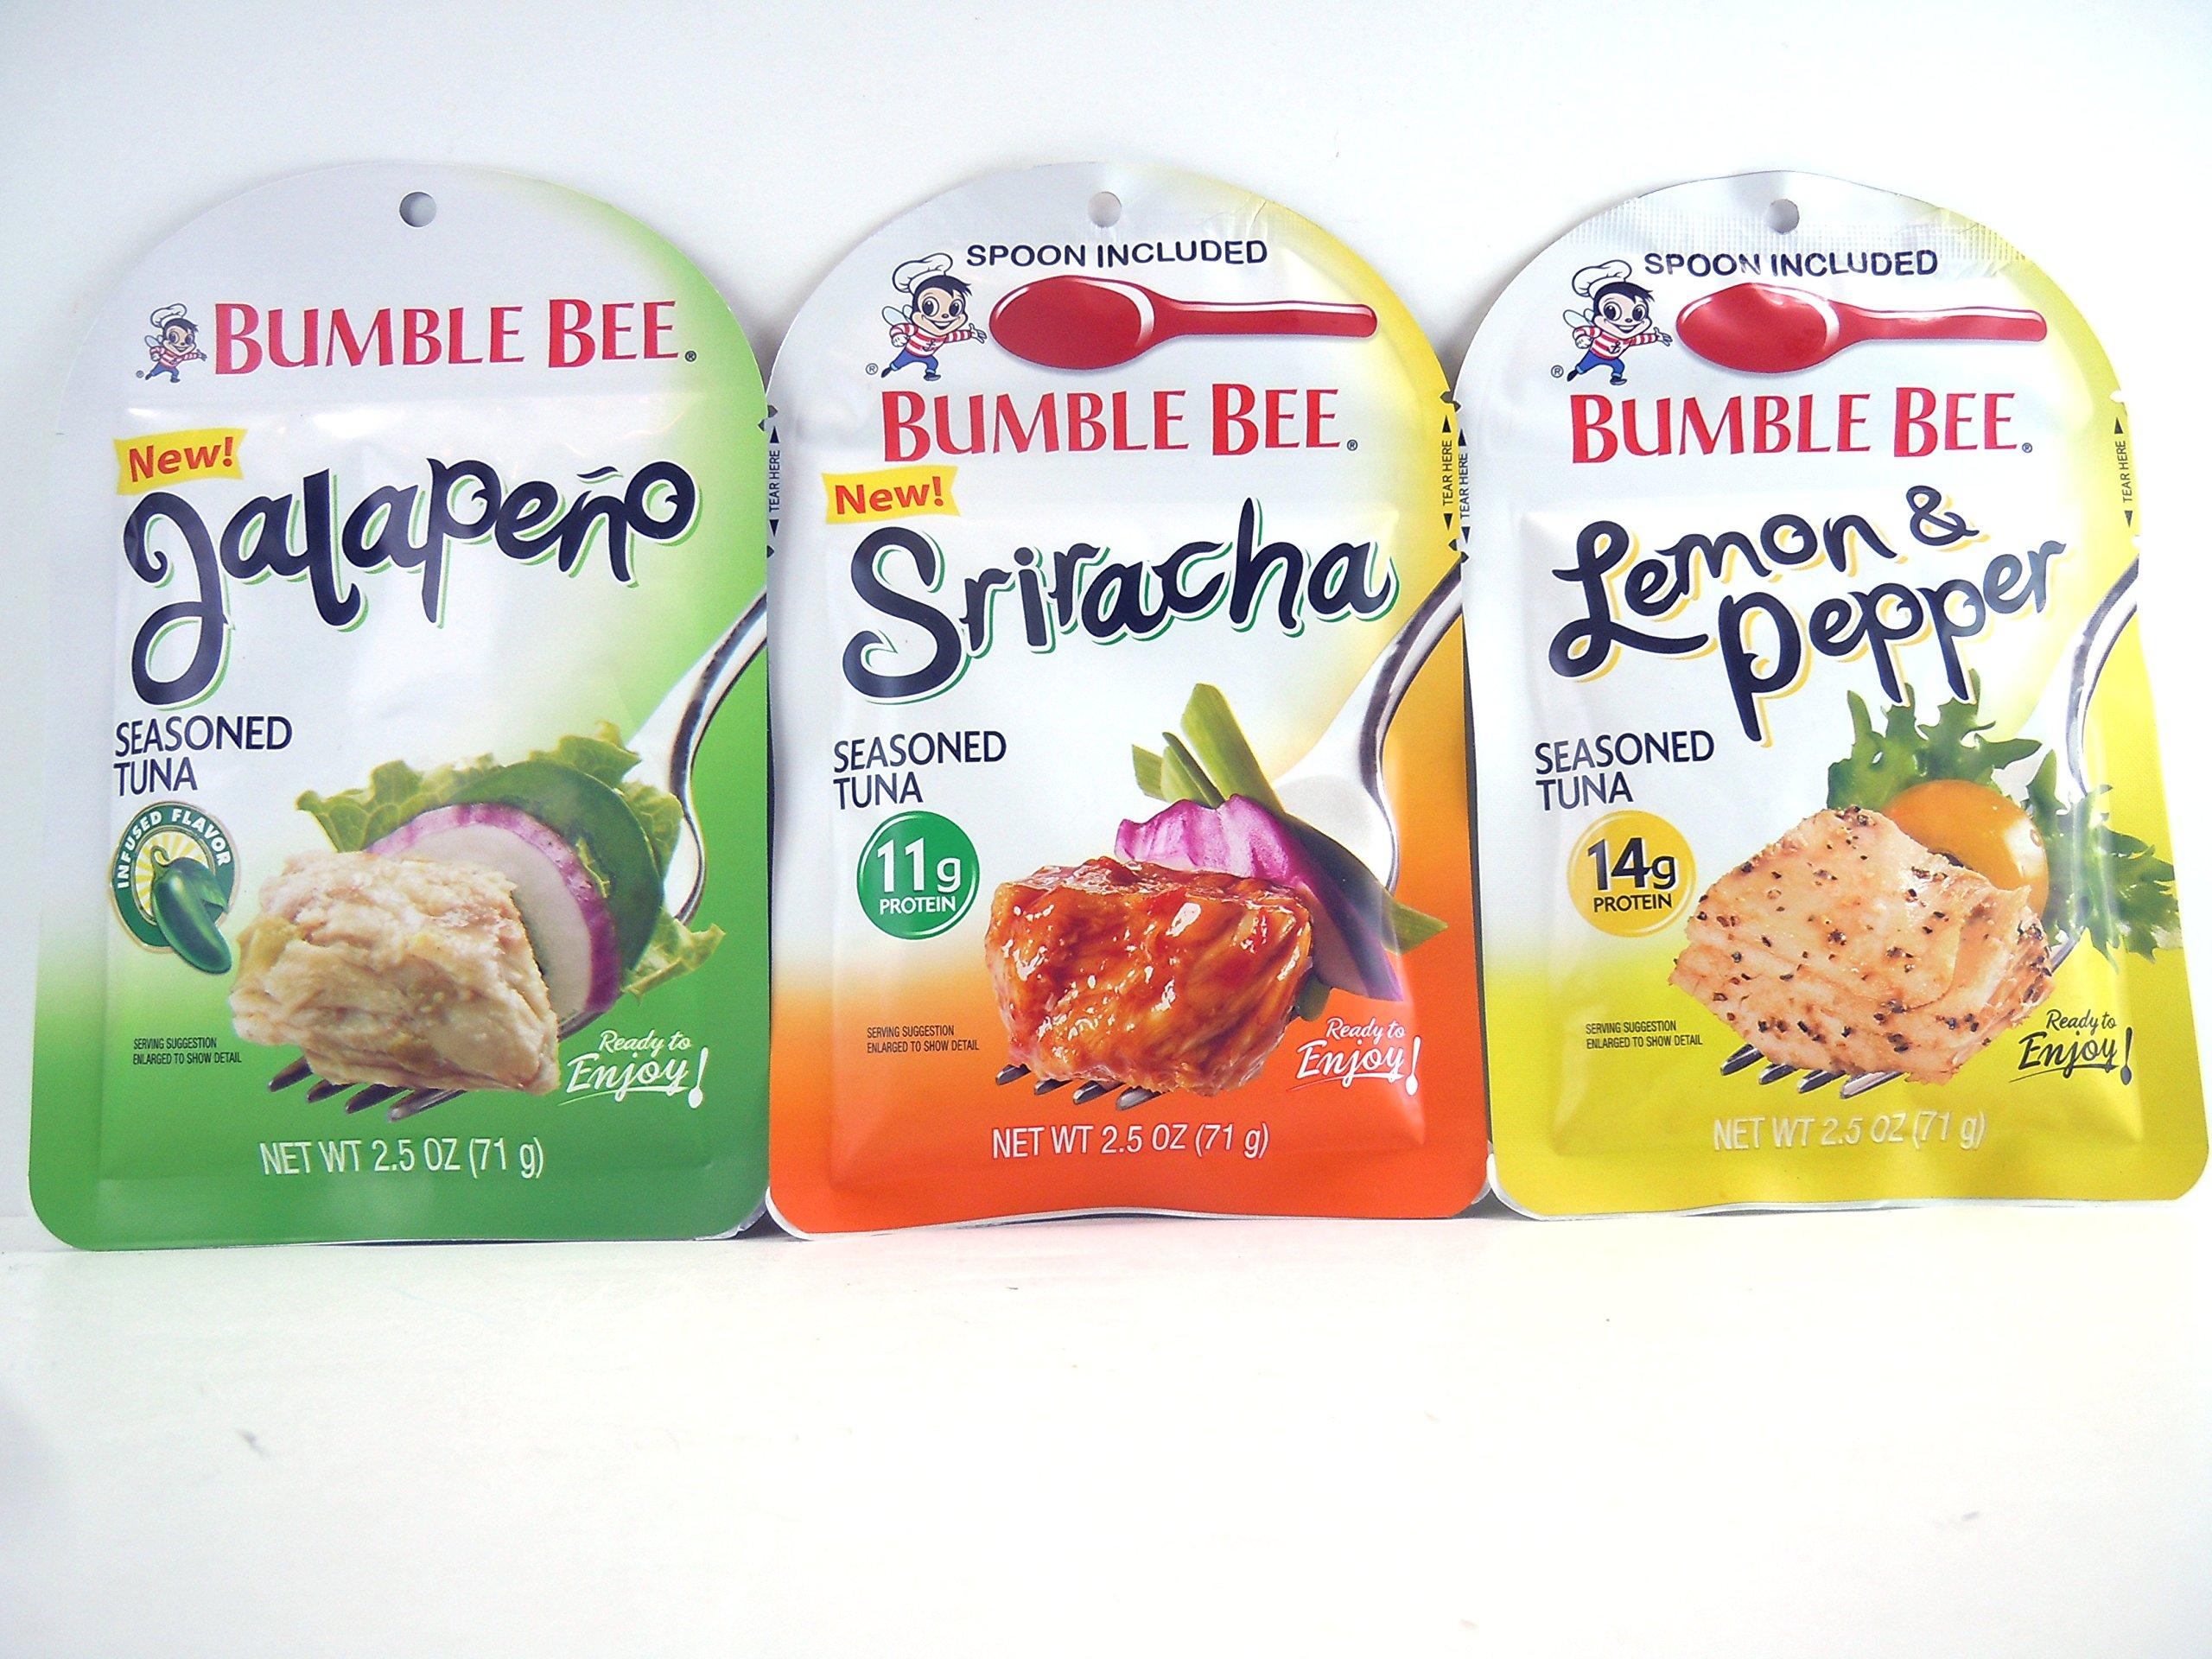 Bumble Bee NEW Seasoned Tuna : Sriracha, Jalapeno, and Lemon & Pepper 2.5 oz.ea. Bundle of 3 Pouches by Bumble Bee